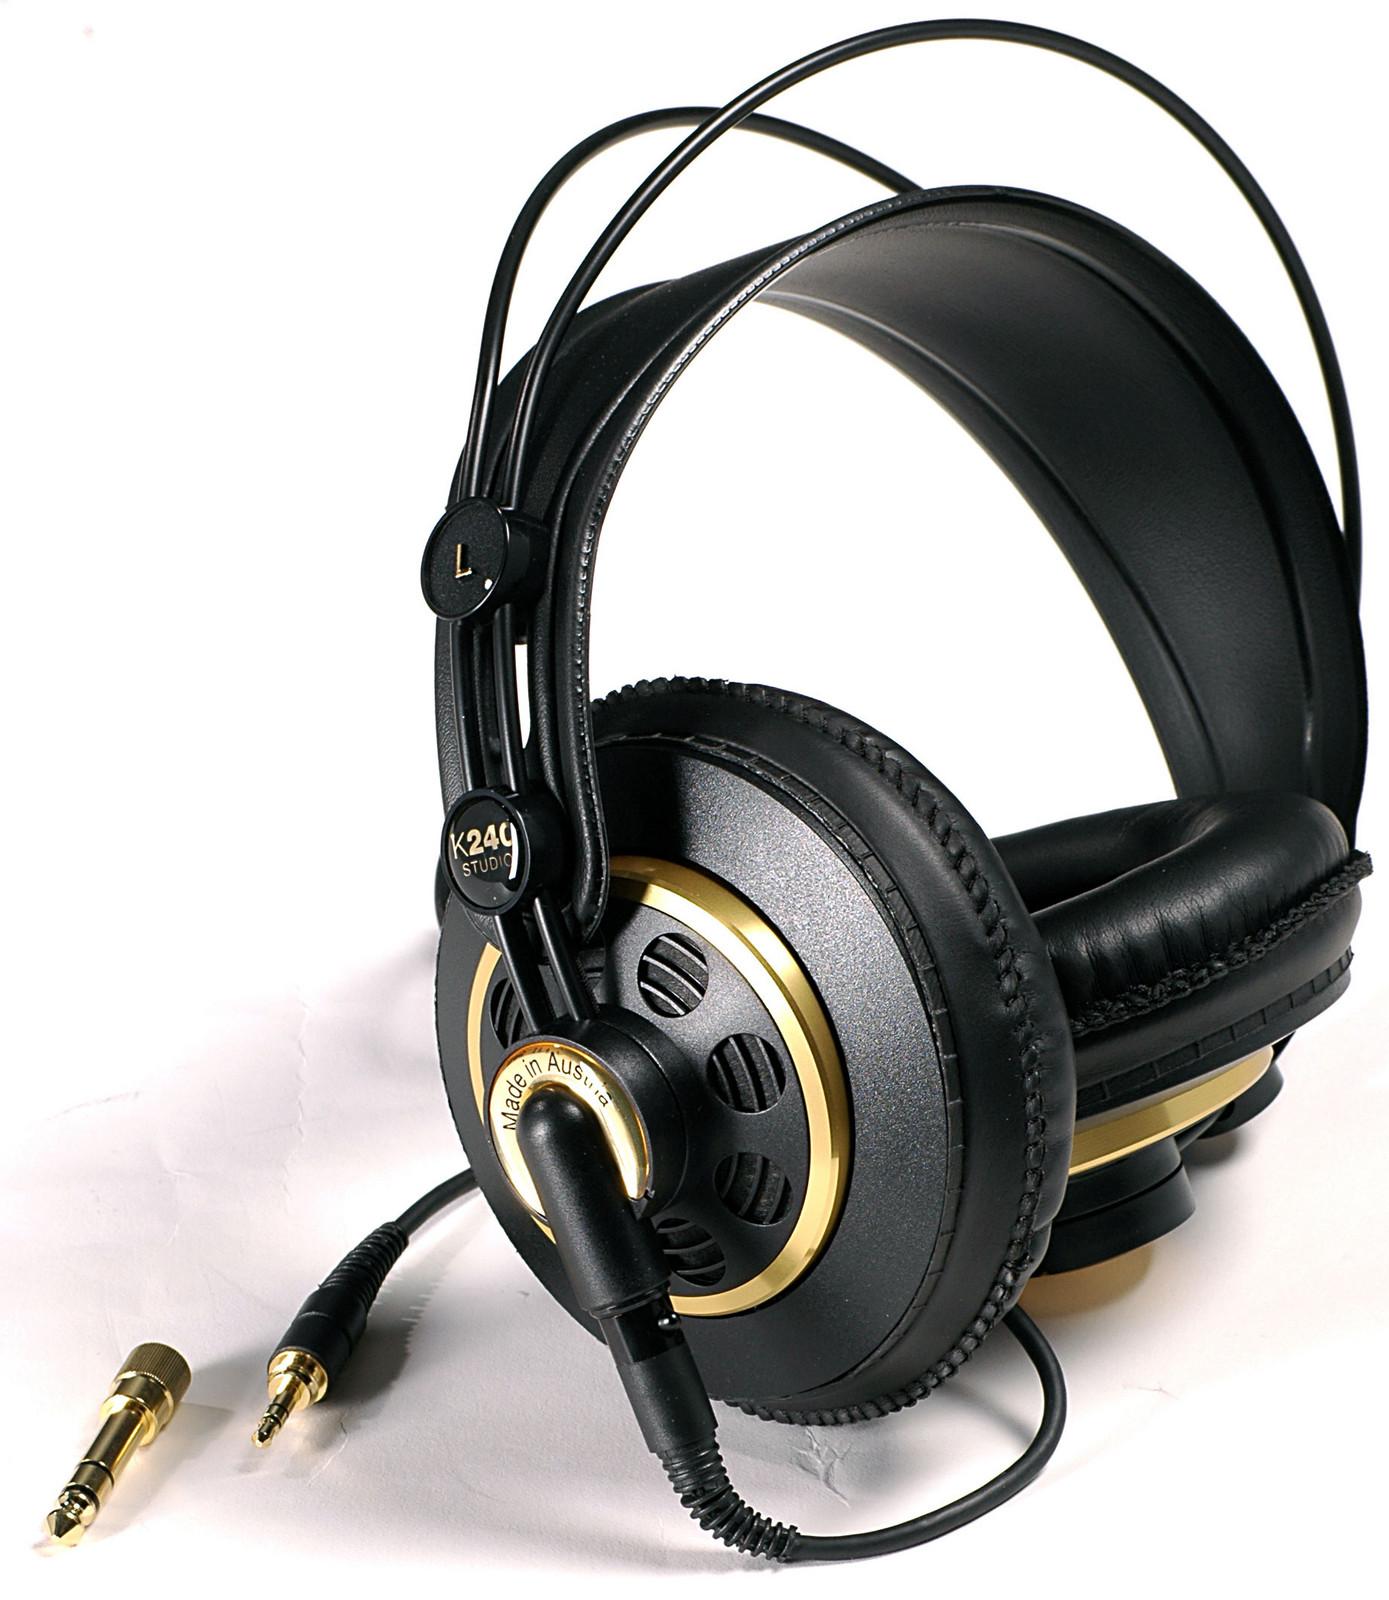 K240 Studio